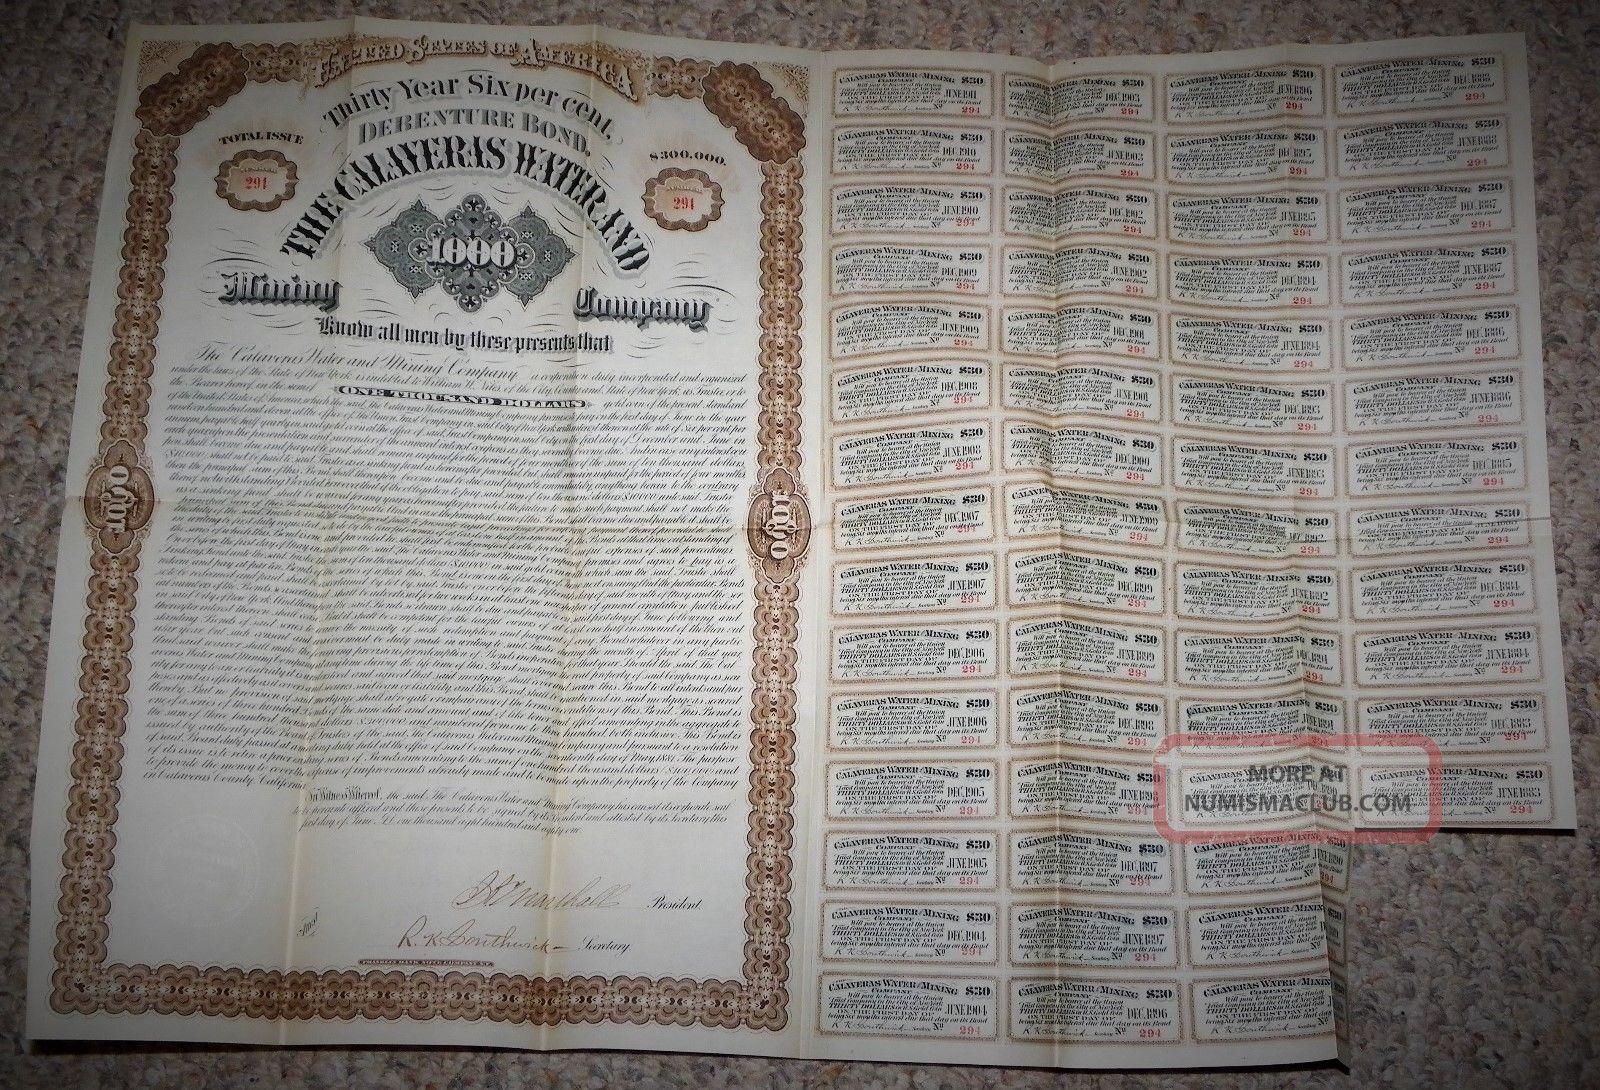 1880 ' S 30 Year Debenture Bond $300,  000 At 6 The Calaveras Water & Mining Co. Stocks & Bonds, Scripophily photo